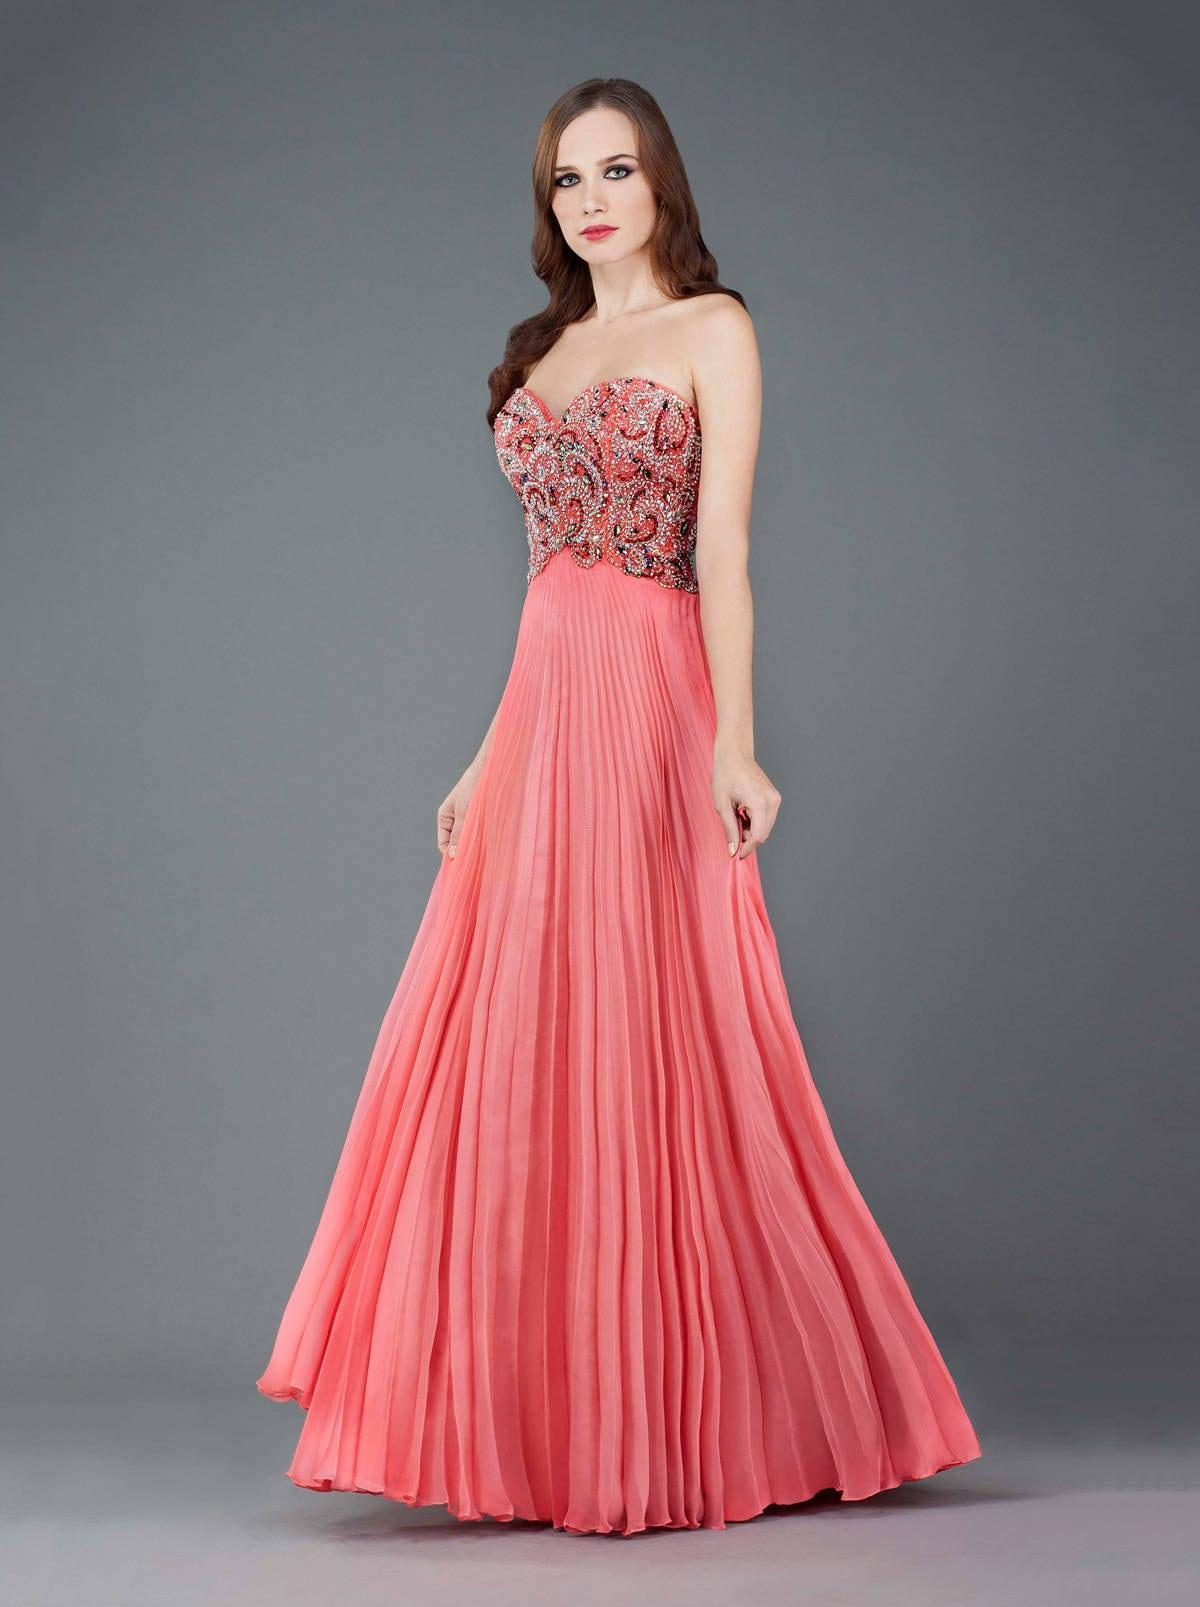 Vestidos de noche de gasa plisada - Darius Cordell Fashion Ltd